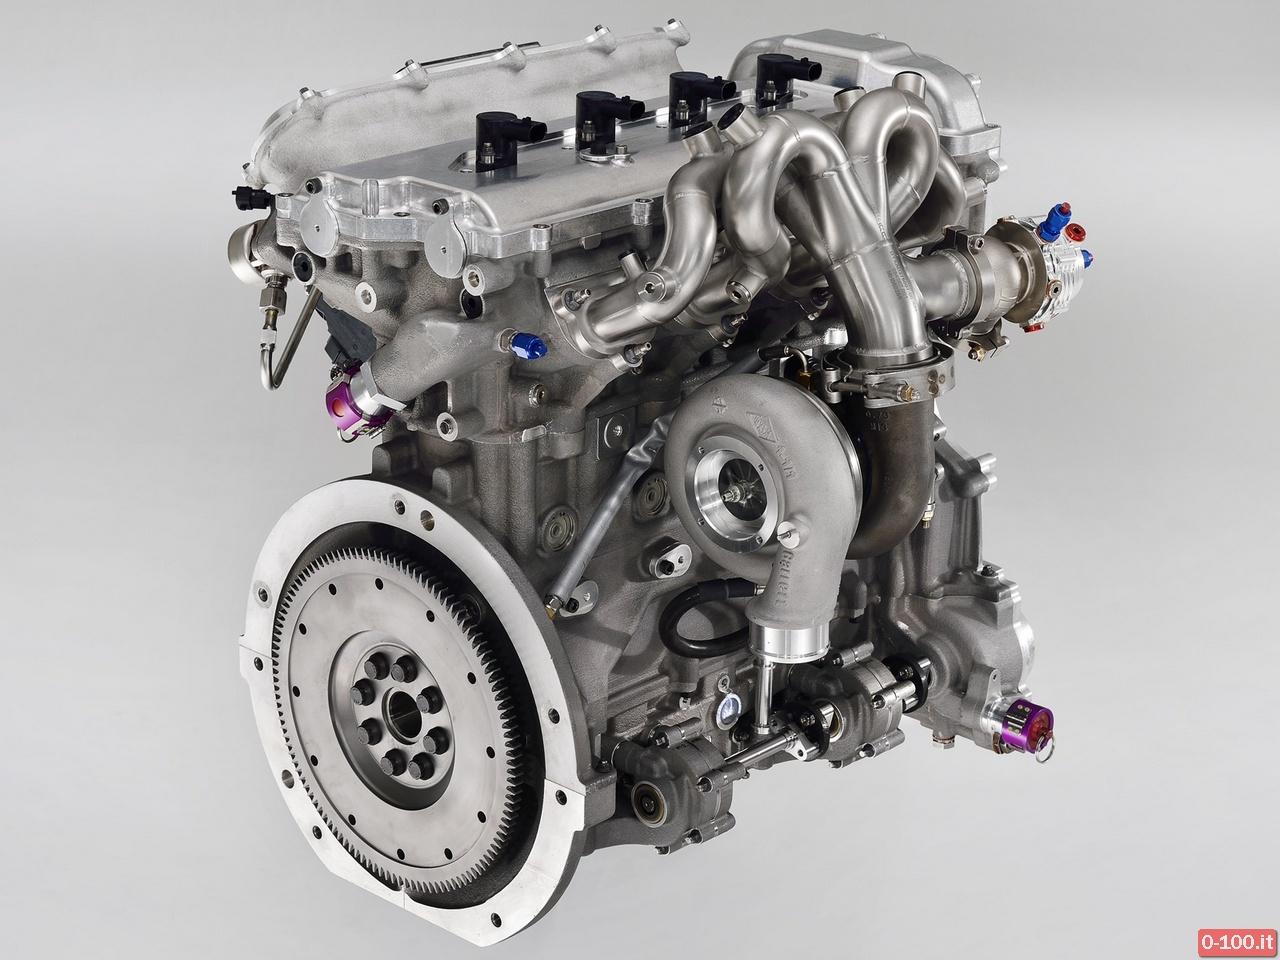 toyota-hybrid-r-engine_0-100_2